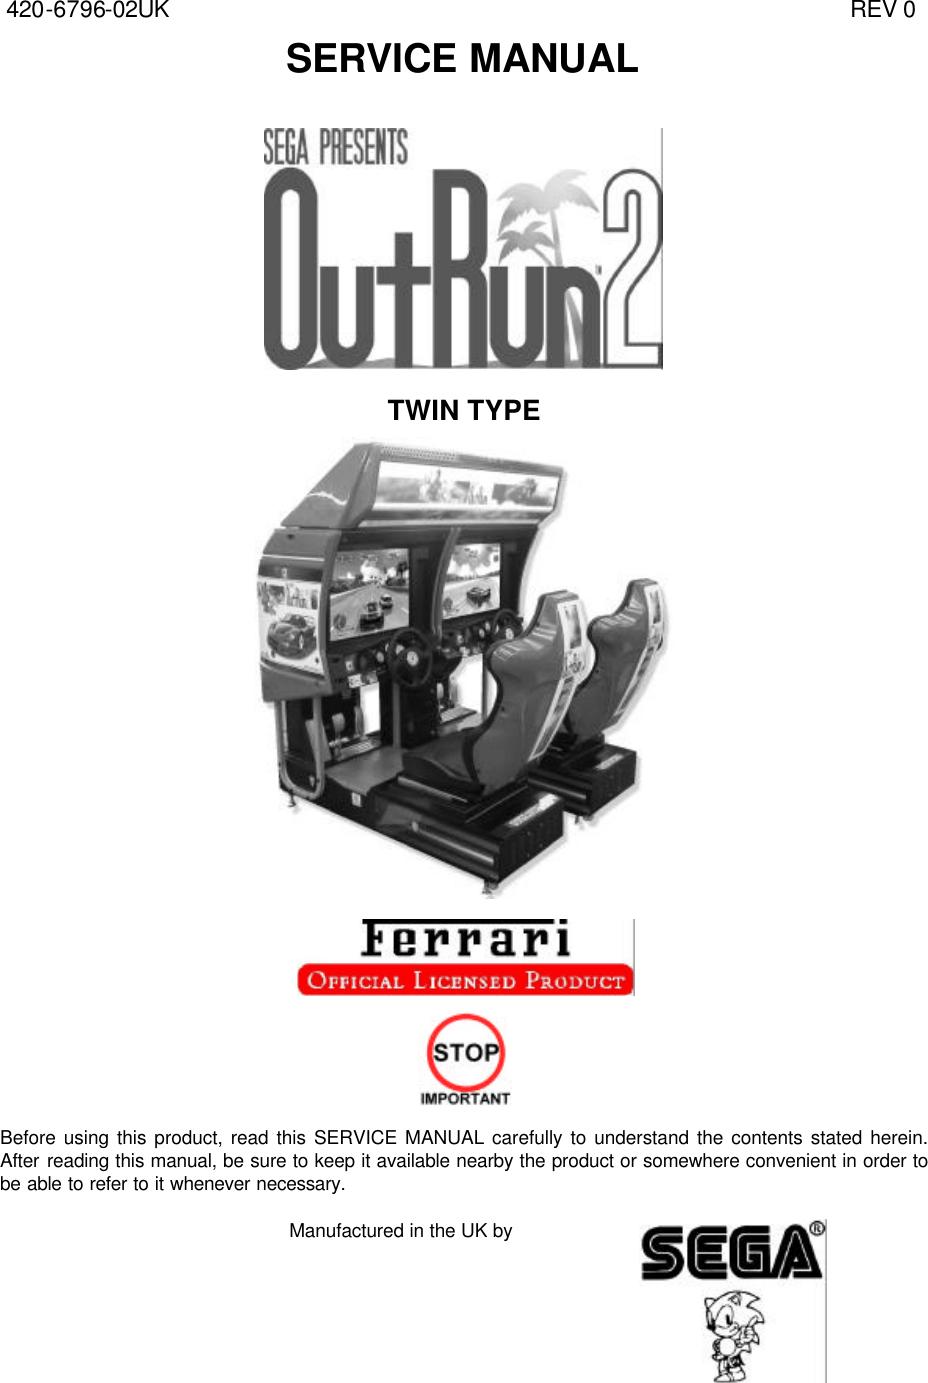 Arcade Outrun 2 Sp Twin Manual OUTRUN2_TWIN UK REV_0 User